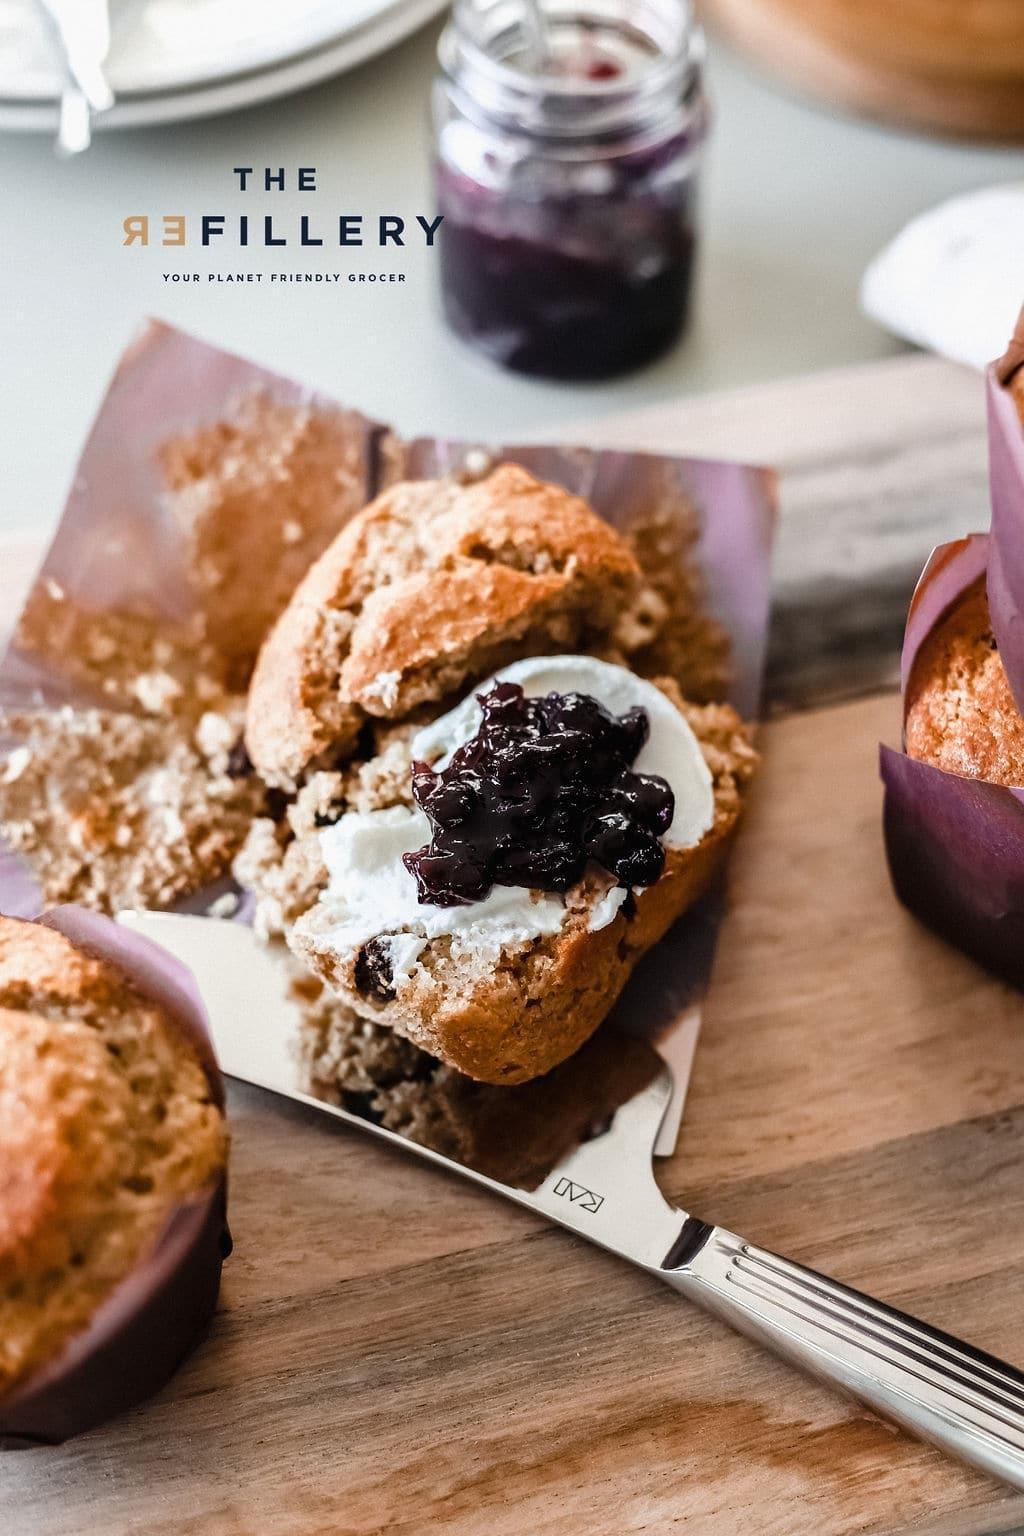 Bran and raisin Muffin